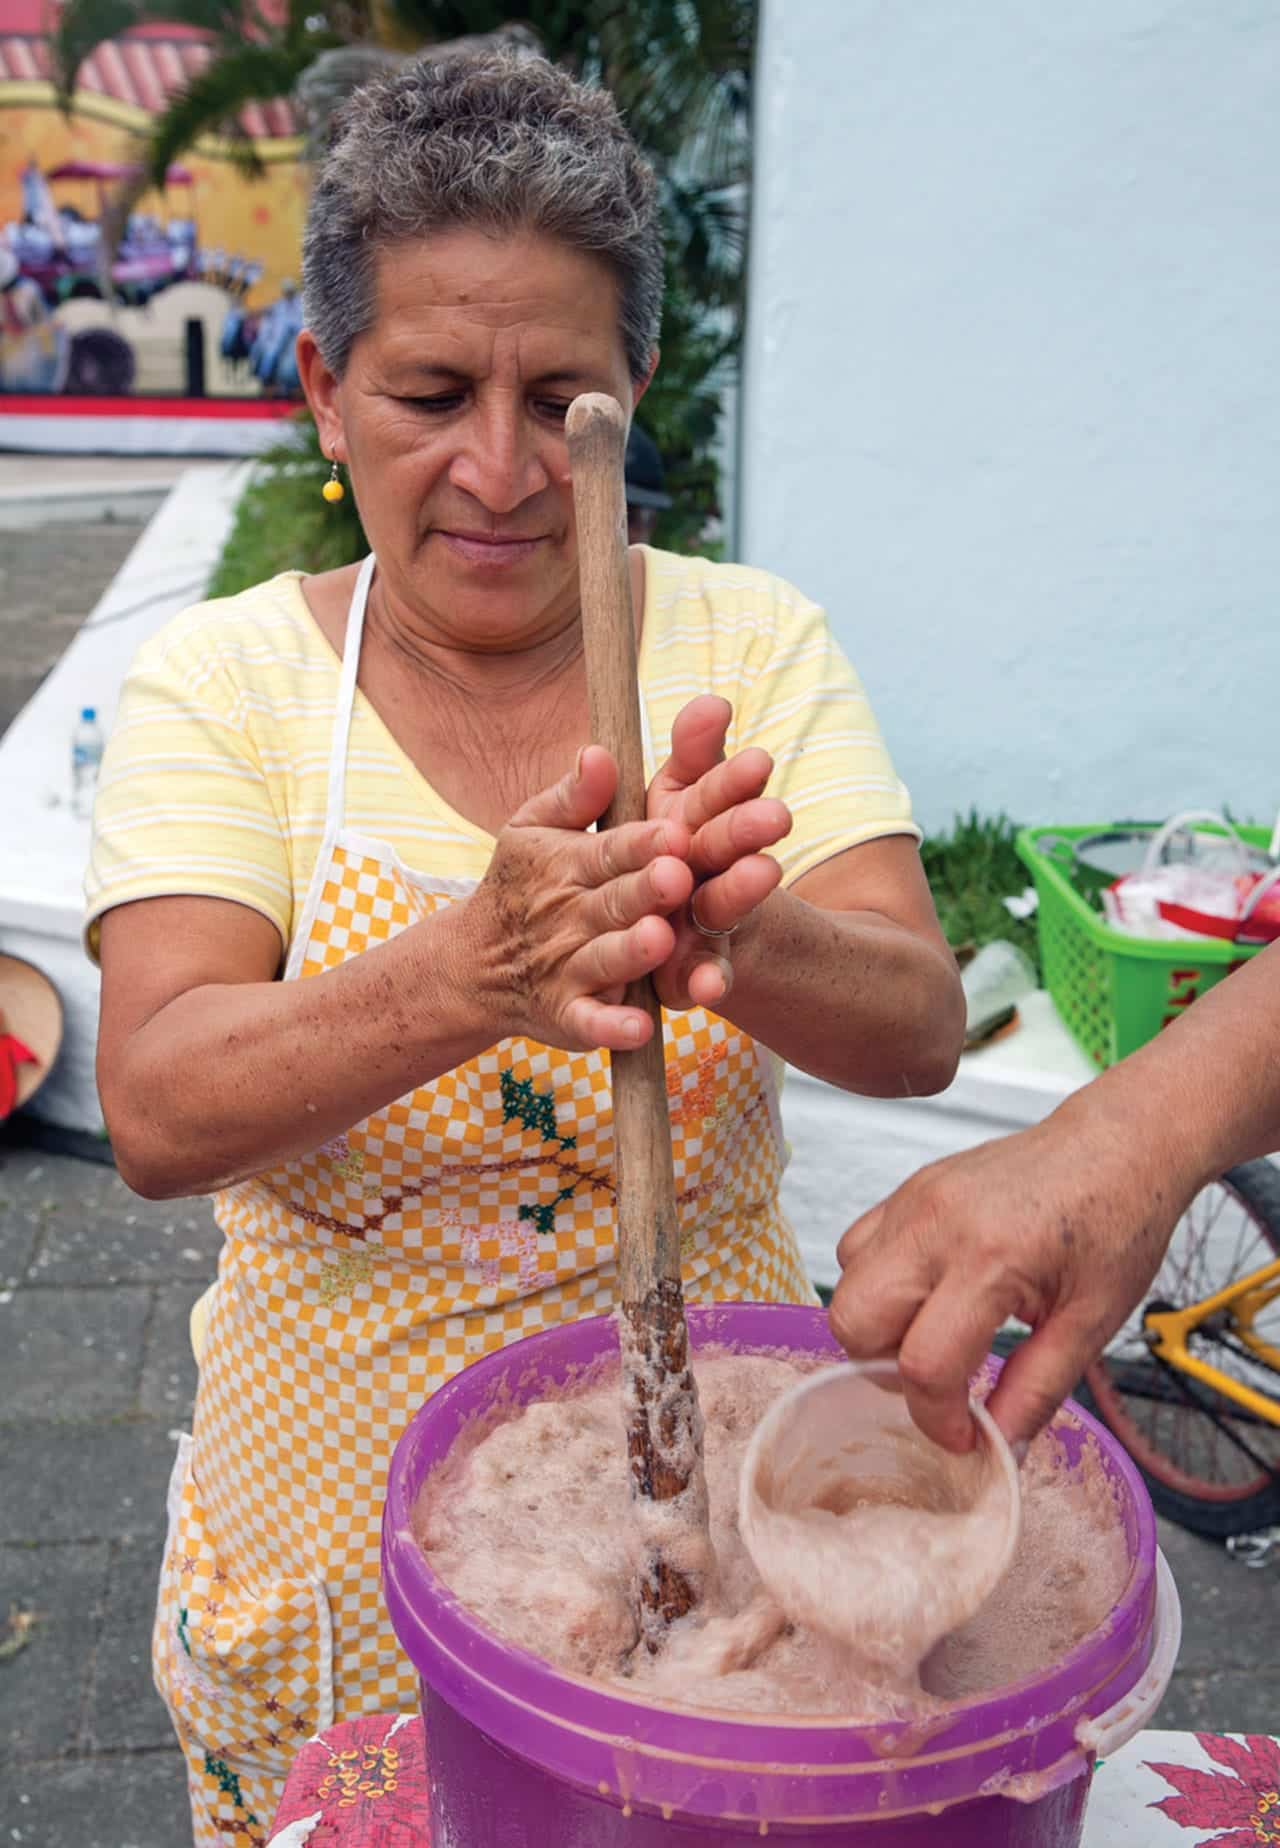 Foto: Mujer preparando popo. © Ediciones Larousse / Francisco Palma.